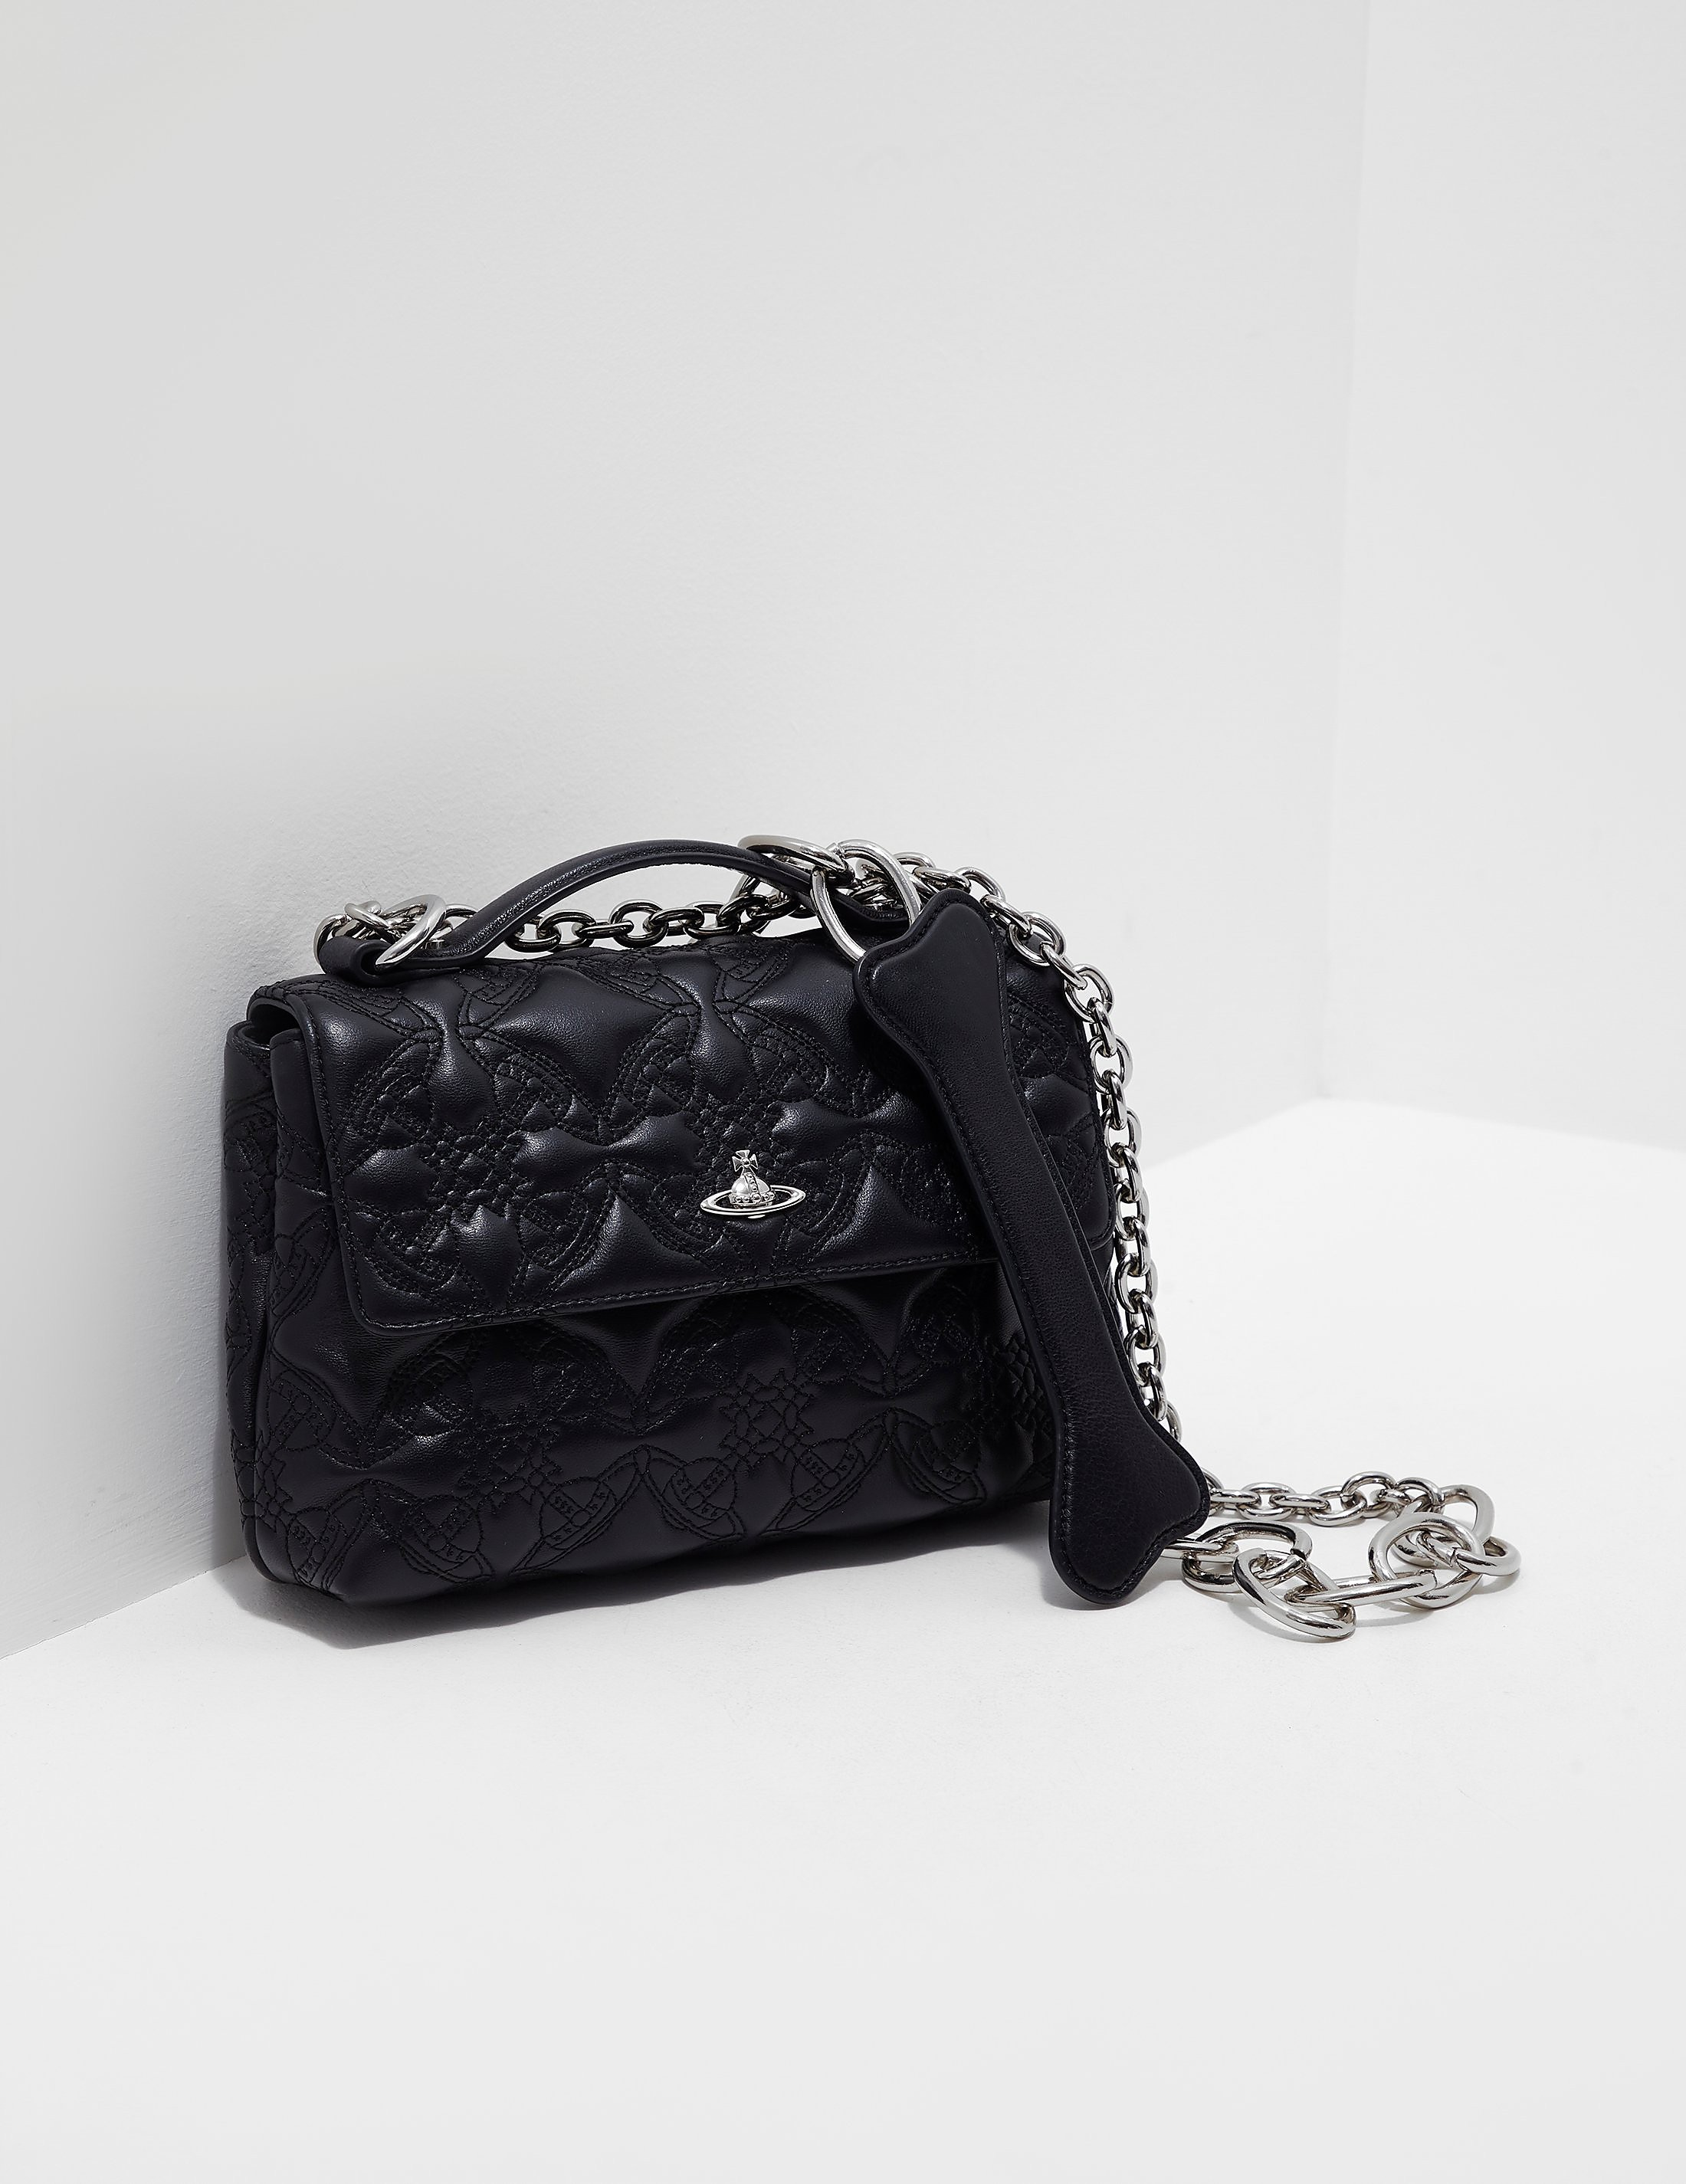 Vivienne Westwood Coventry Bag